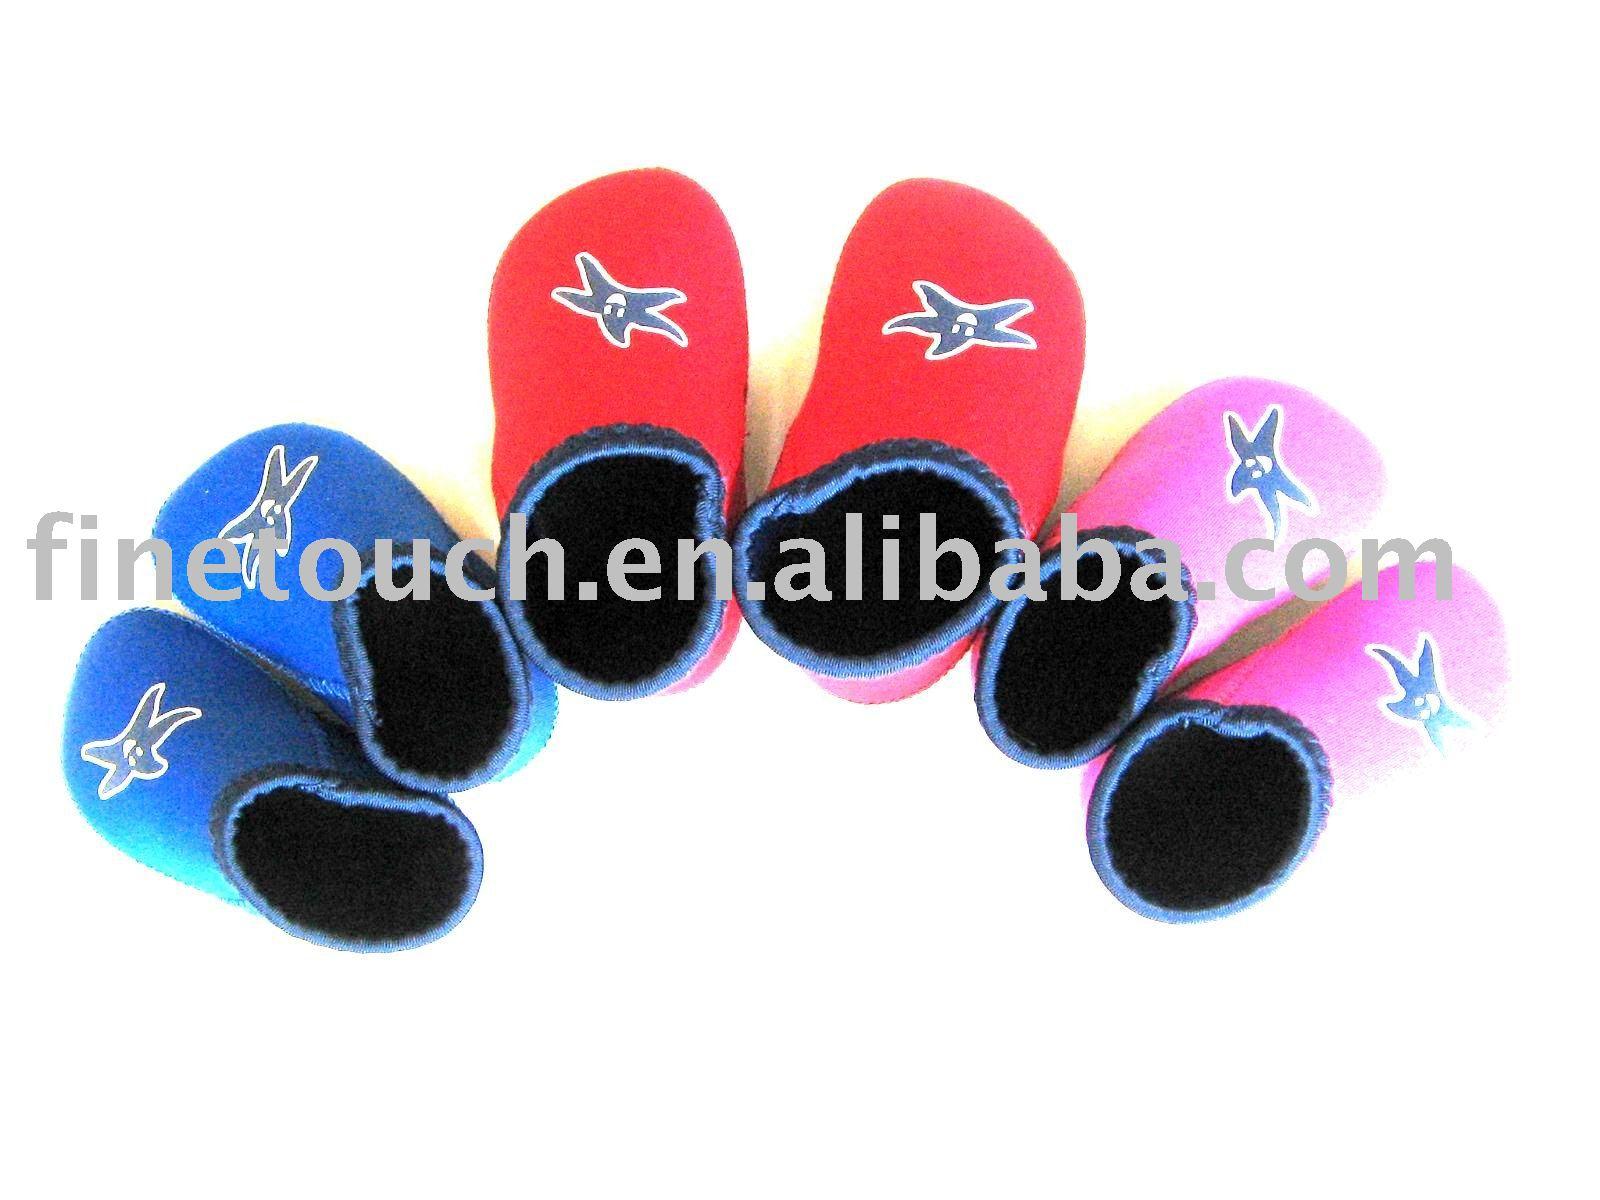 Hot sell Neoprene BB shoes